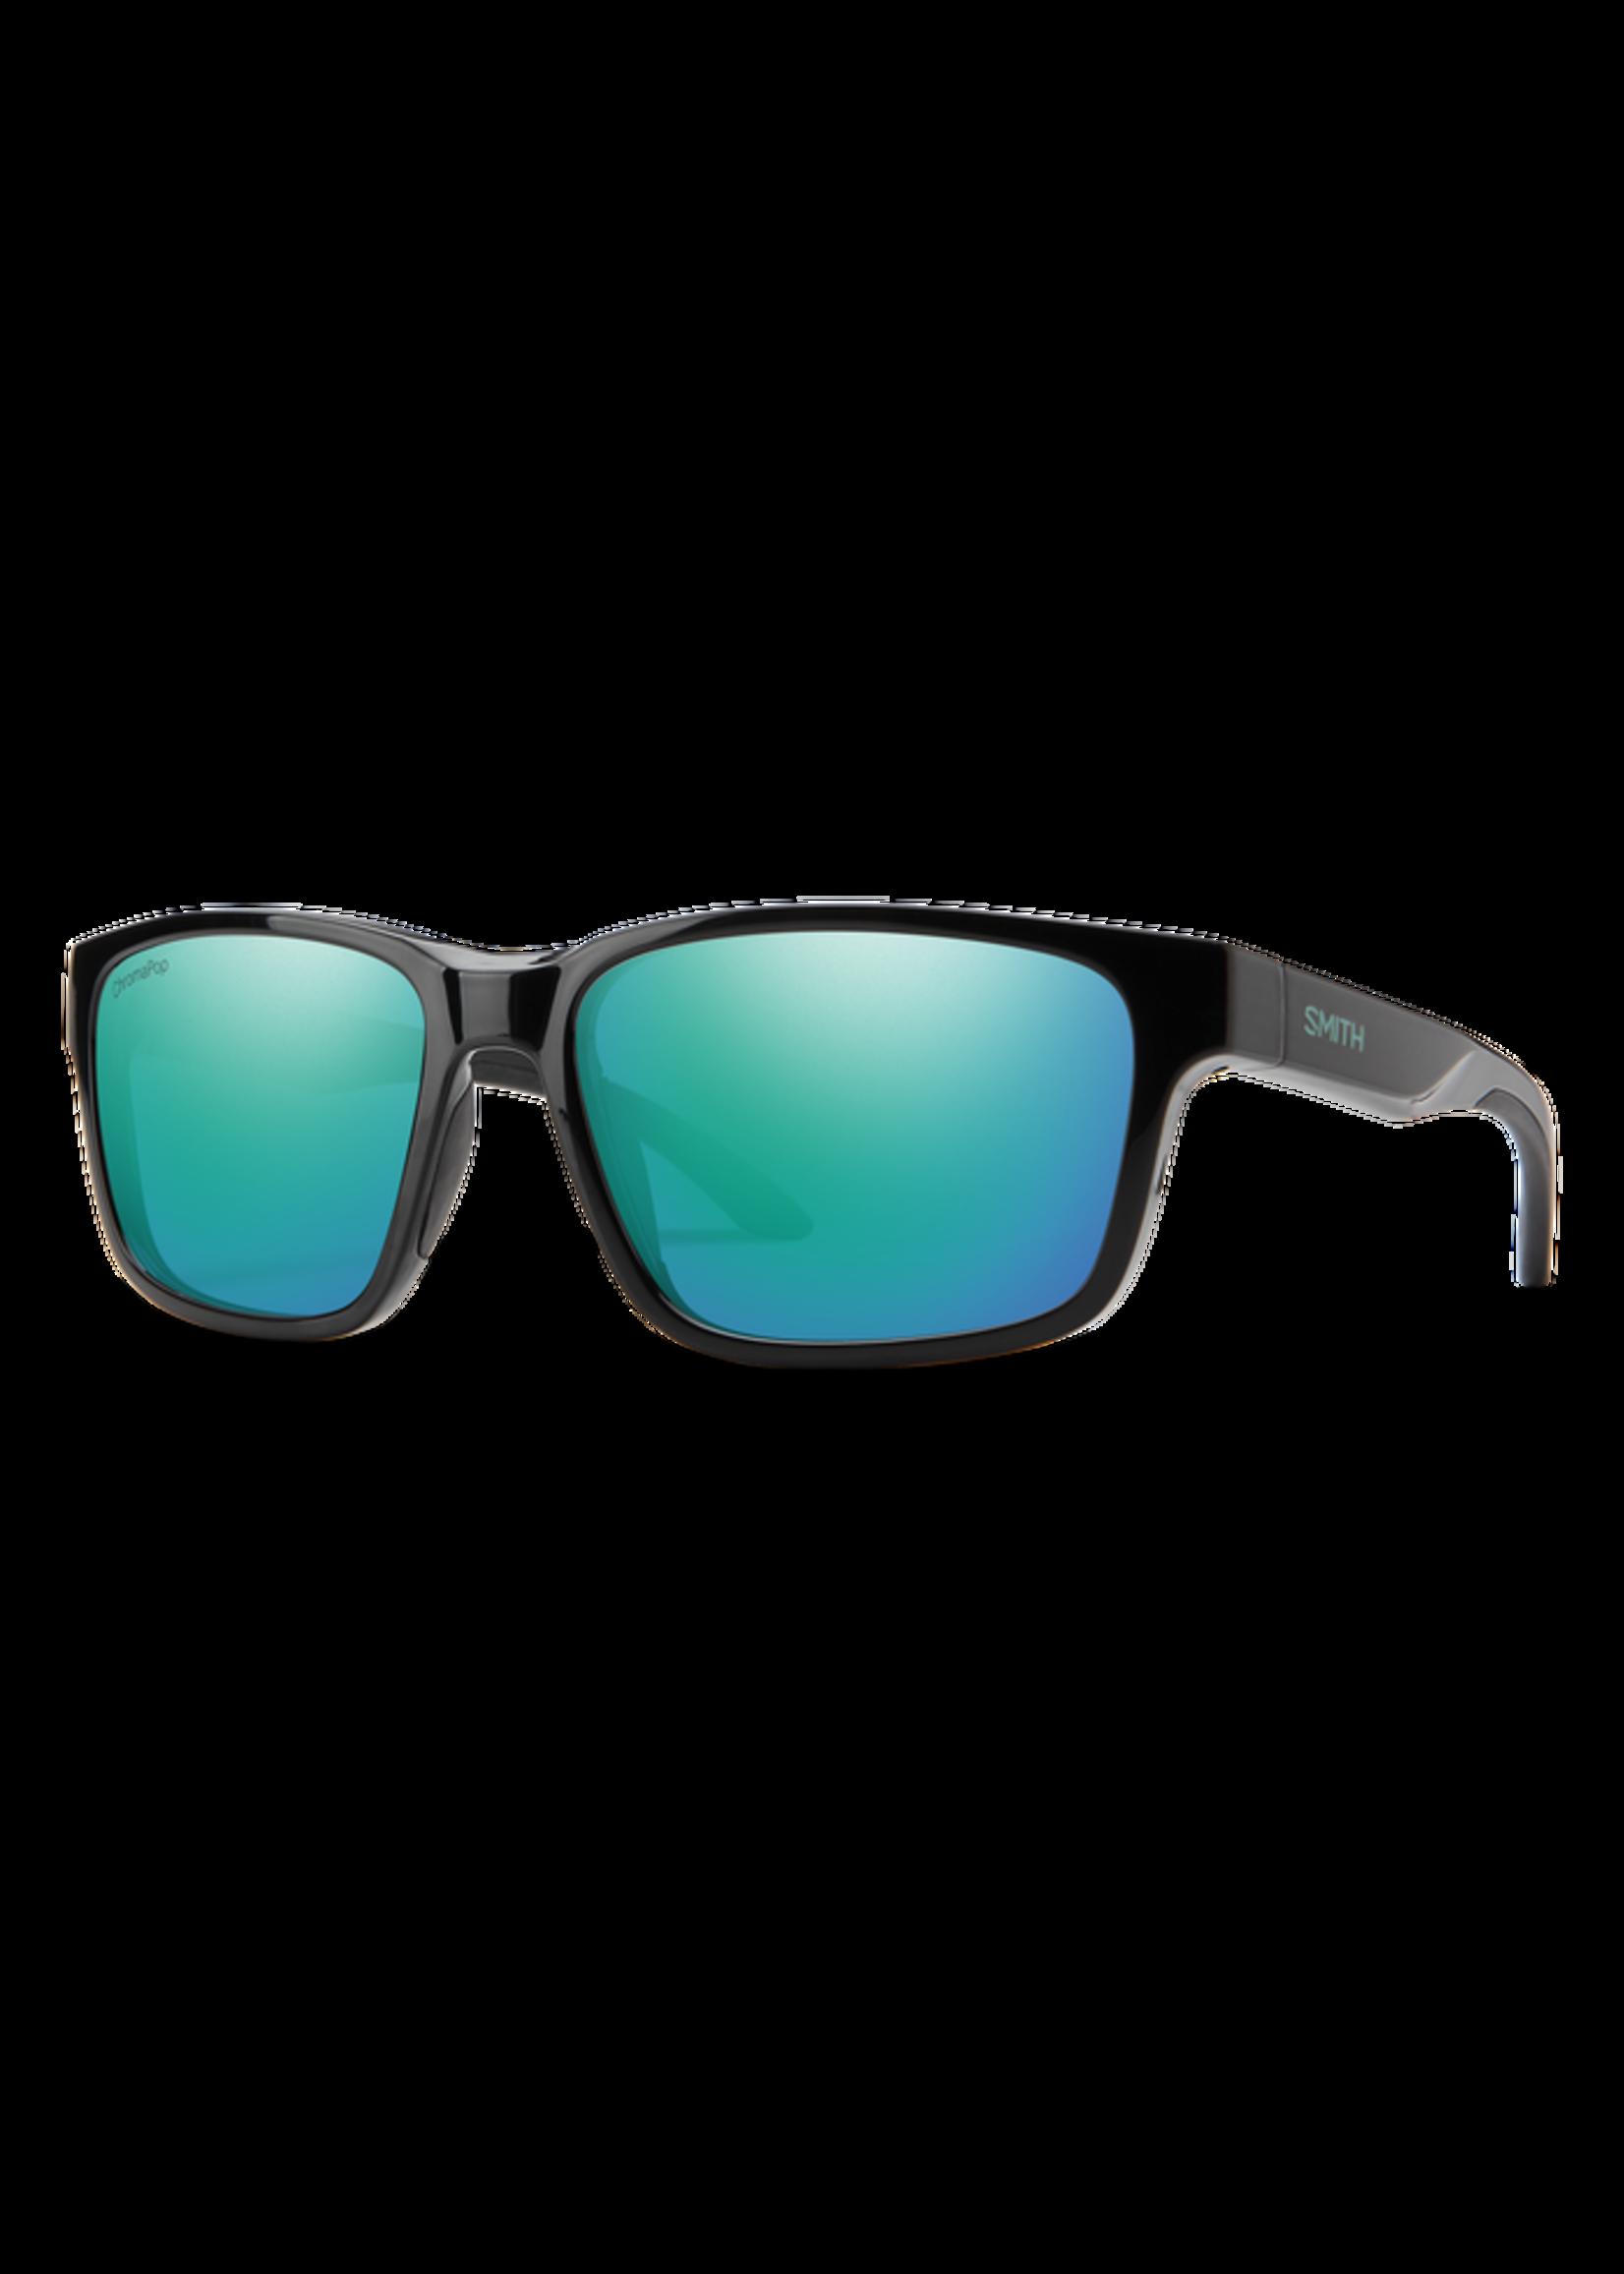 smith Smith Basecamp Sunglasses